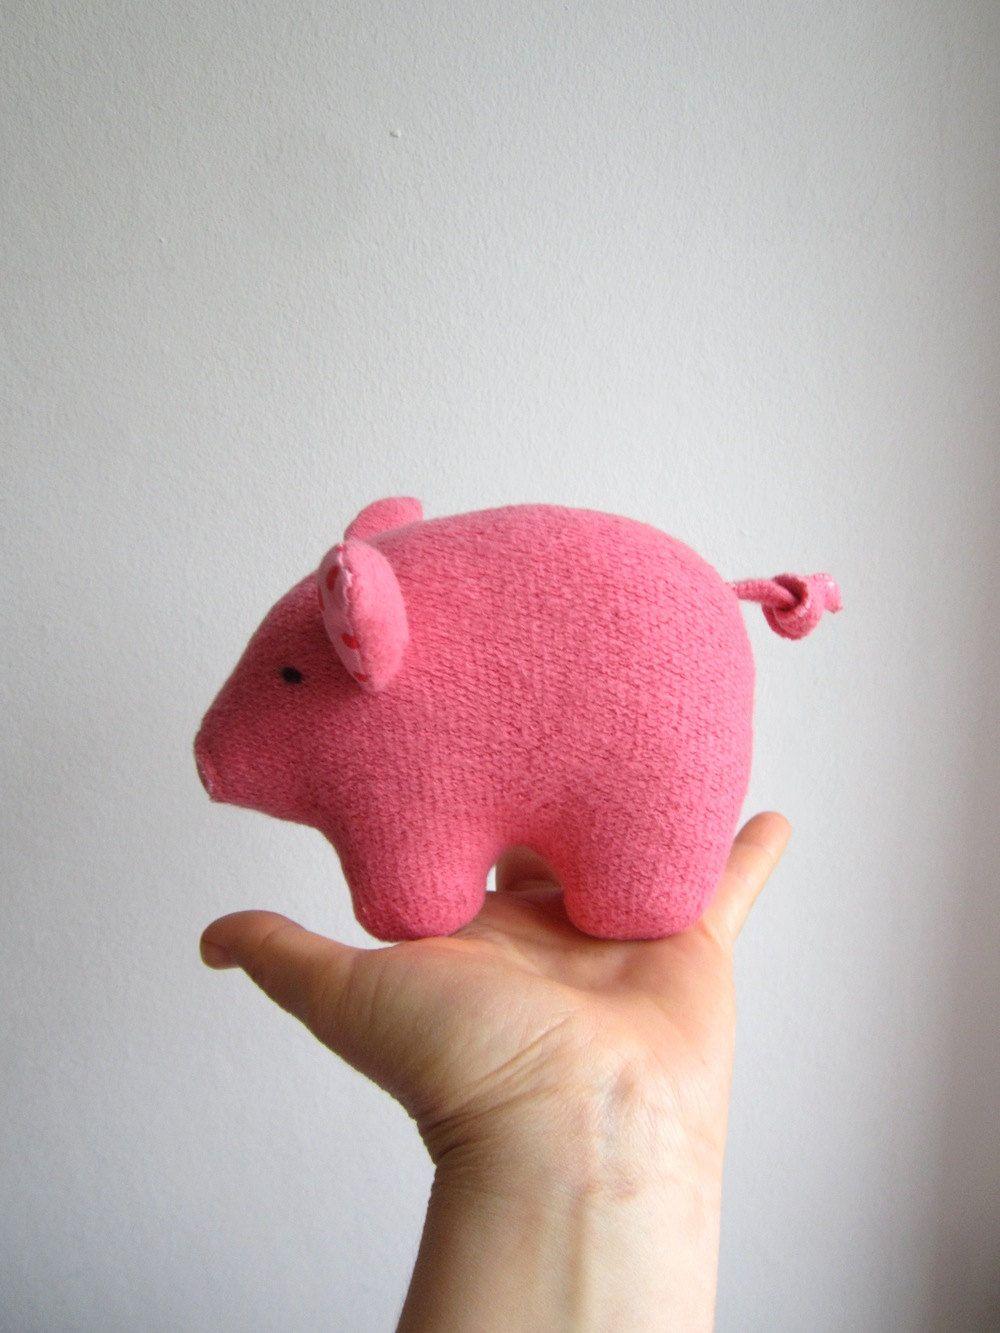 Pig, piglet, organic, pink, soft, toy, animal, baby, safe